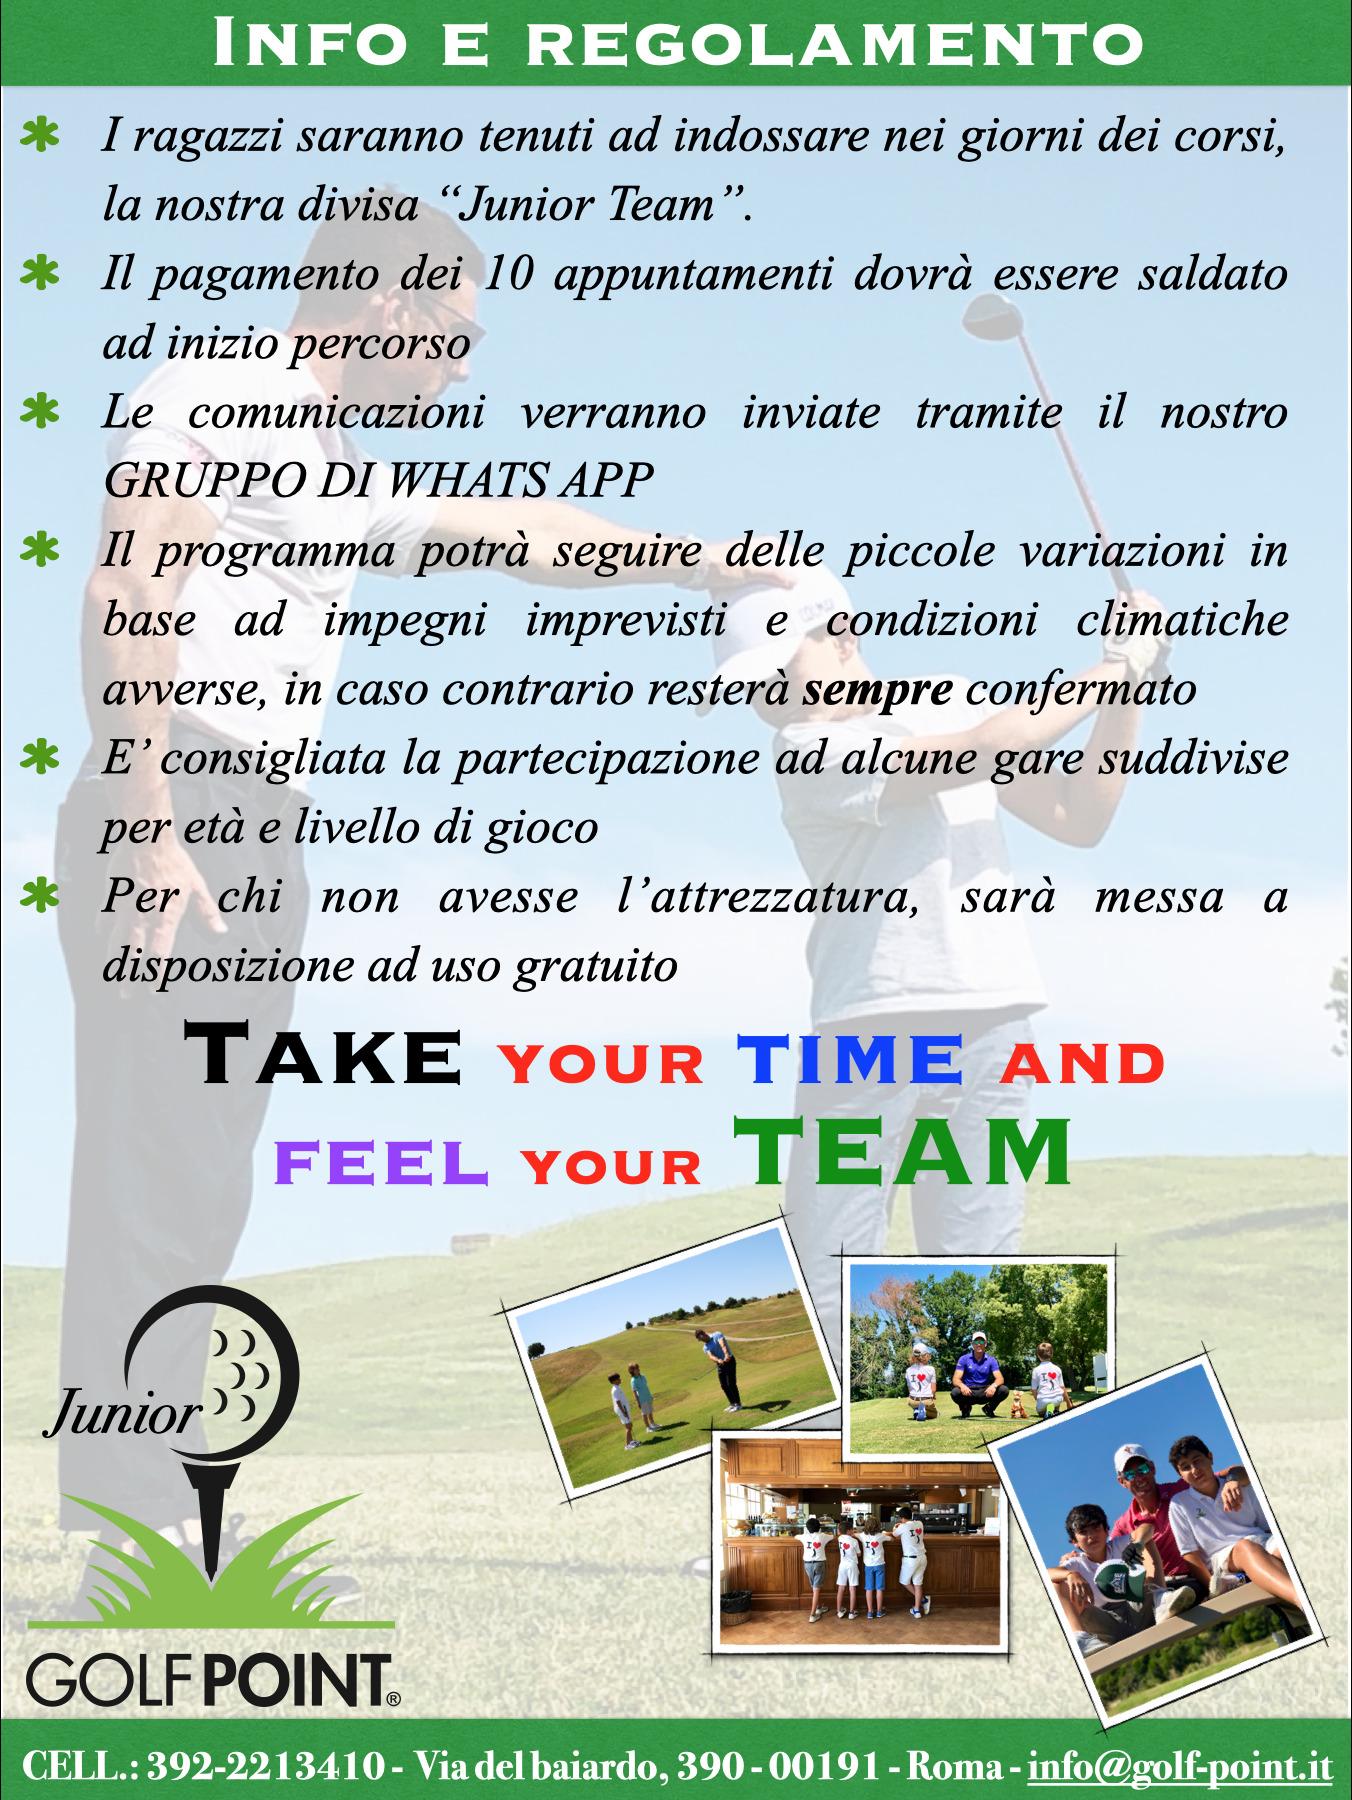 CELL.: 392-2213410 -  Via del baiardo, 390 - 00191 - Roma - info@golf-point.it